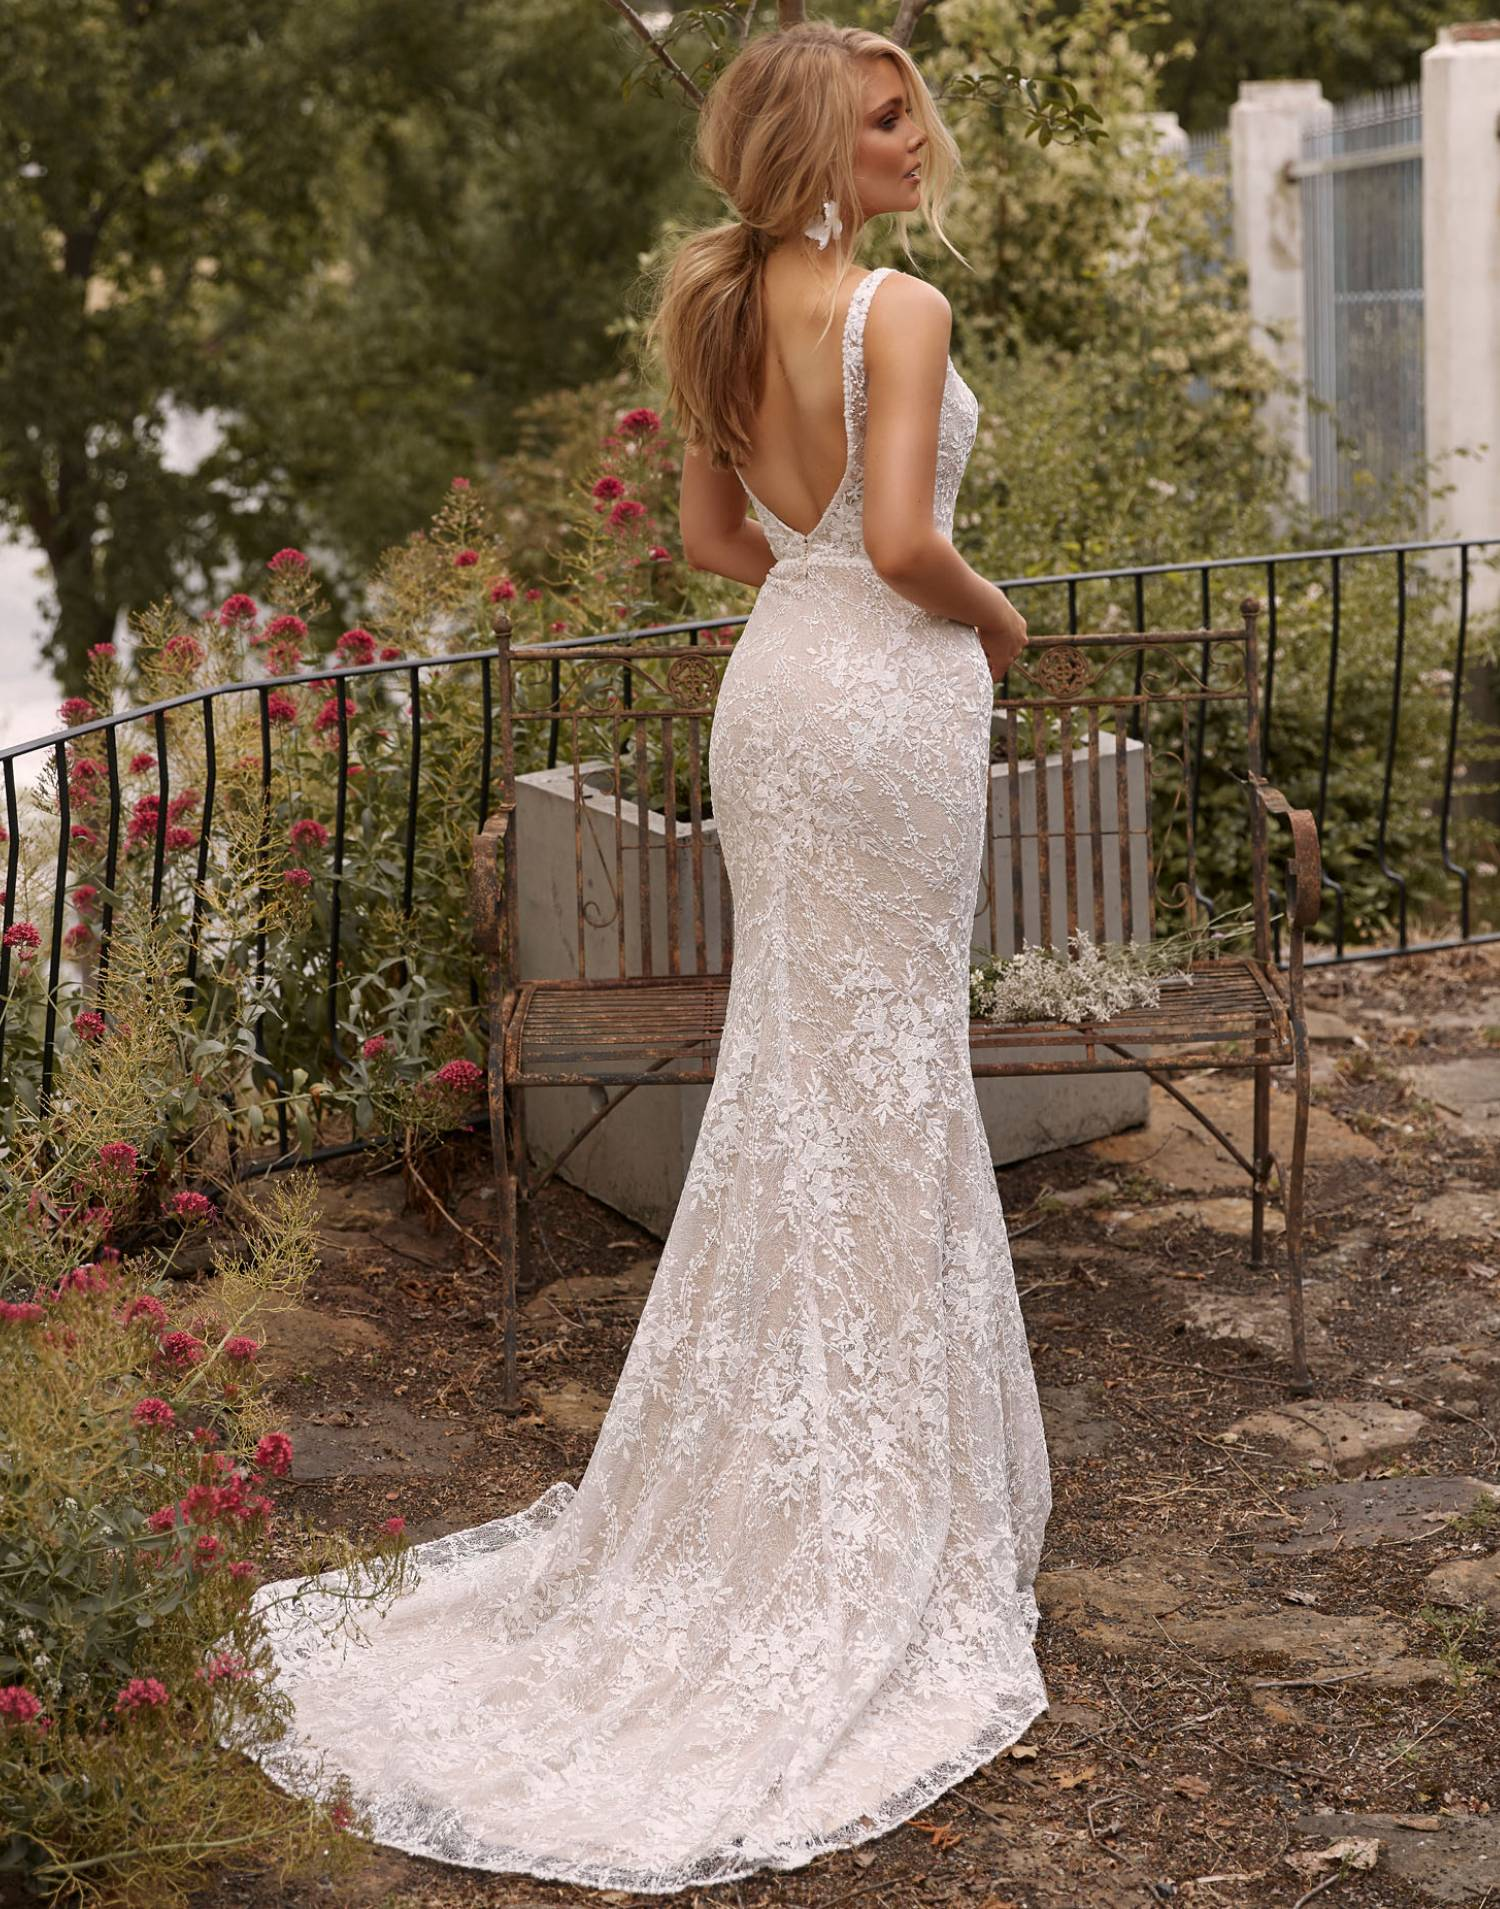 Cayla-wedding-dress-madi-lane-bridal-back-view-with-overskir-min